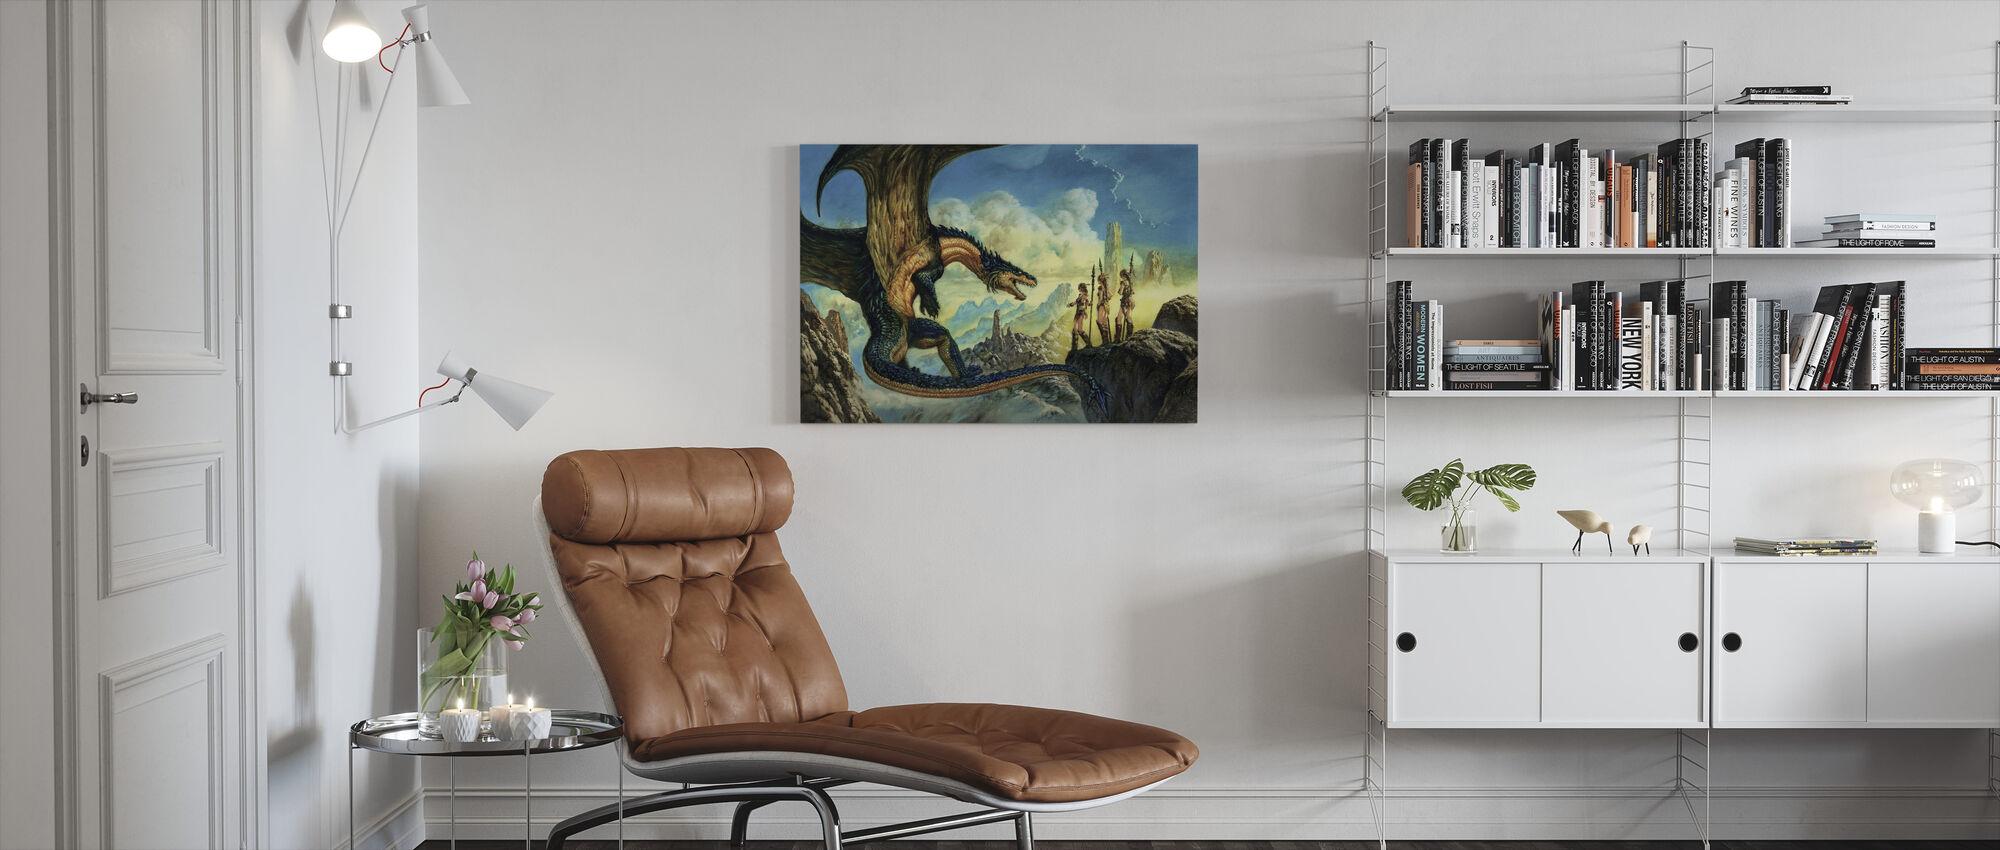 Aliance - Canvas print - Living Room